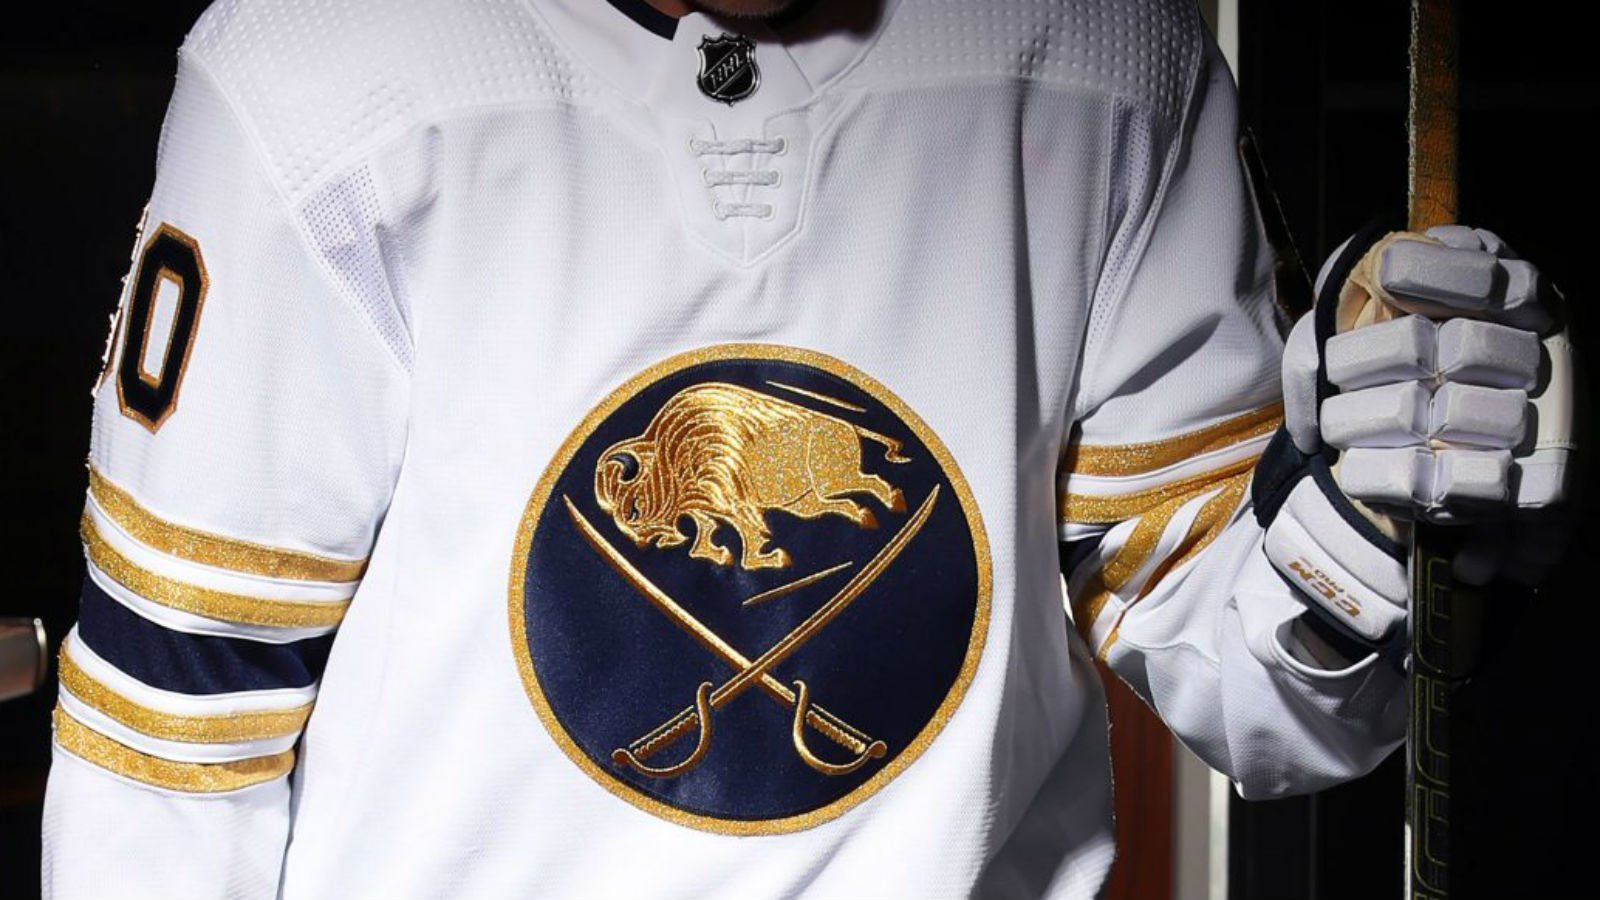 The Buffalo Sabres debut a gold jersey for their special season